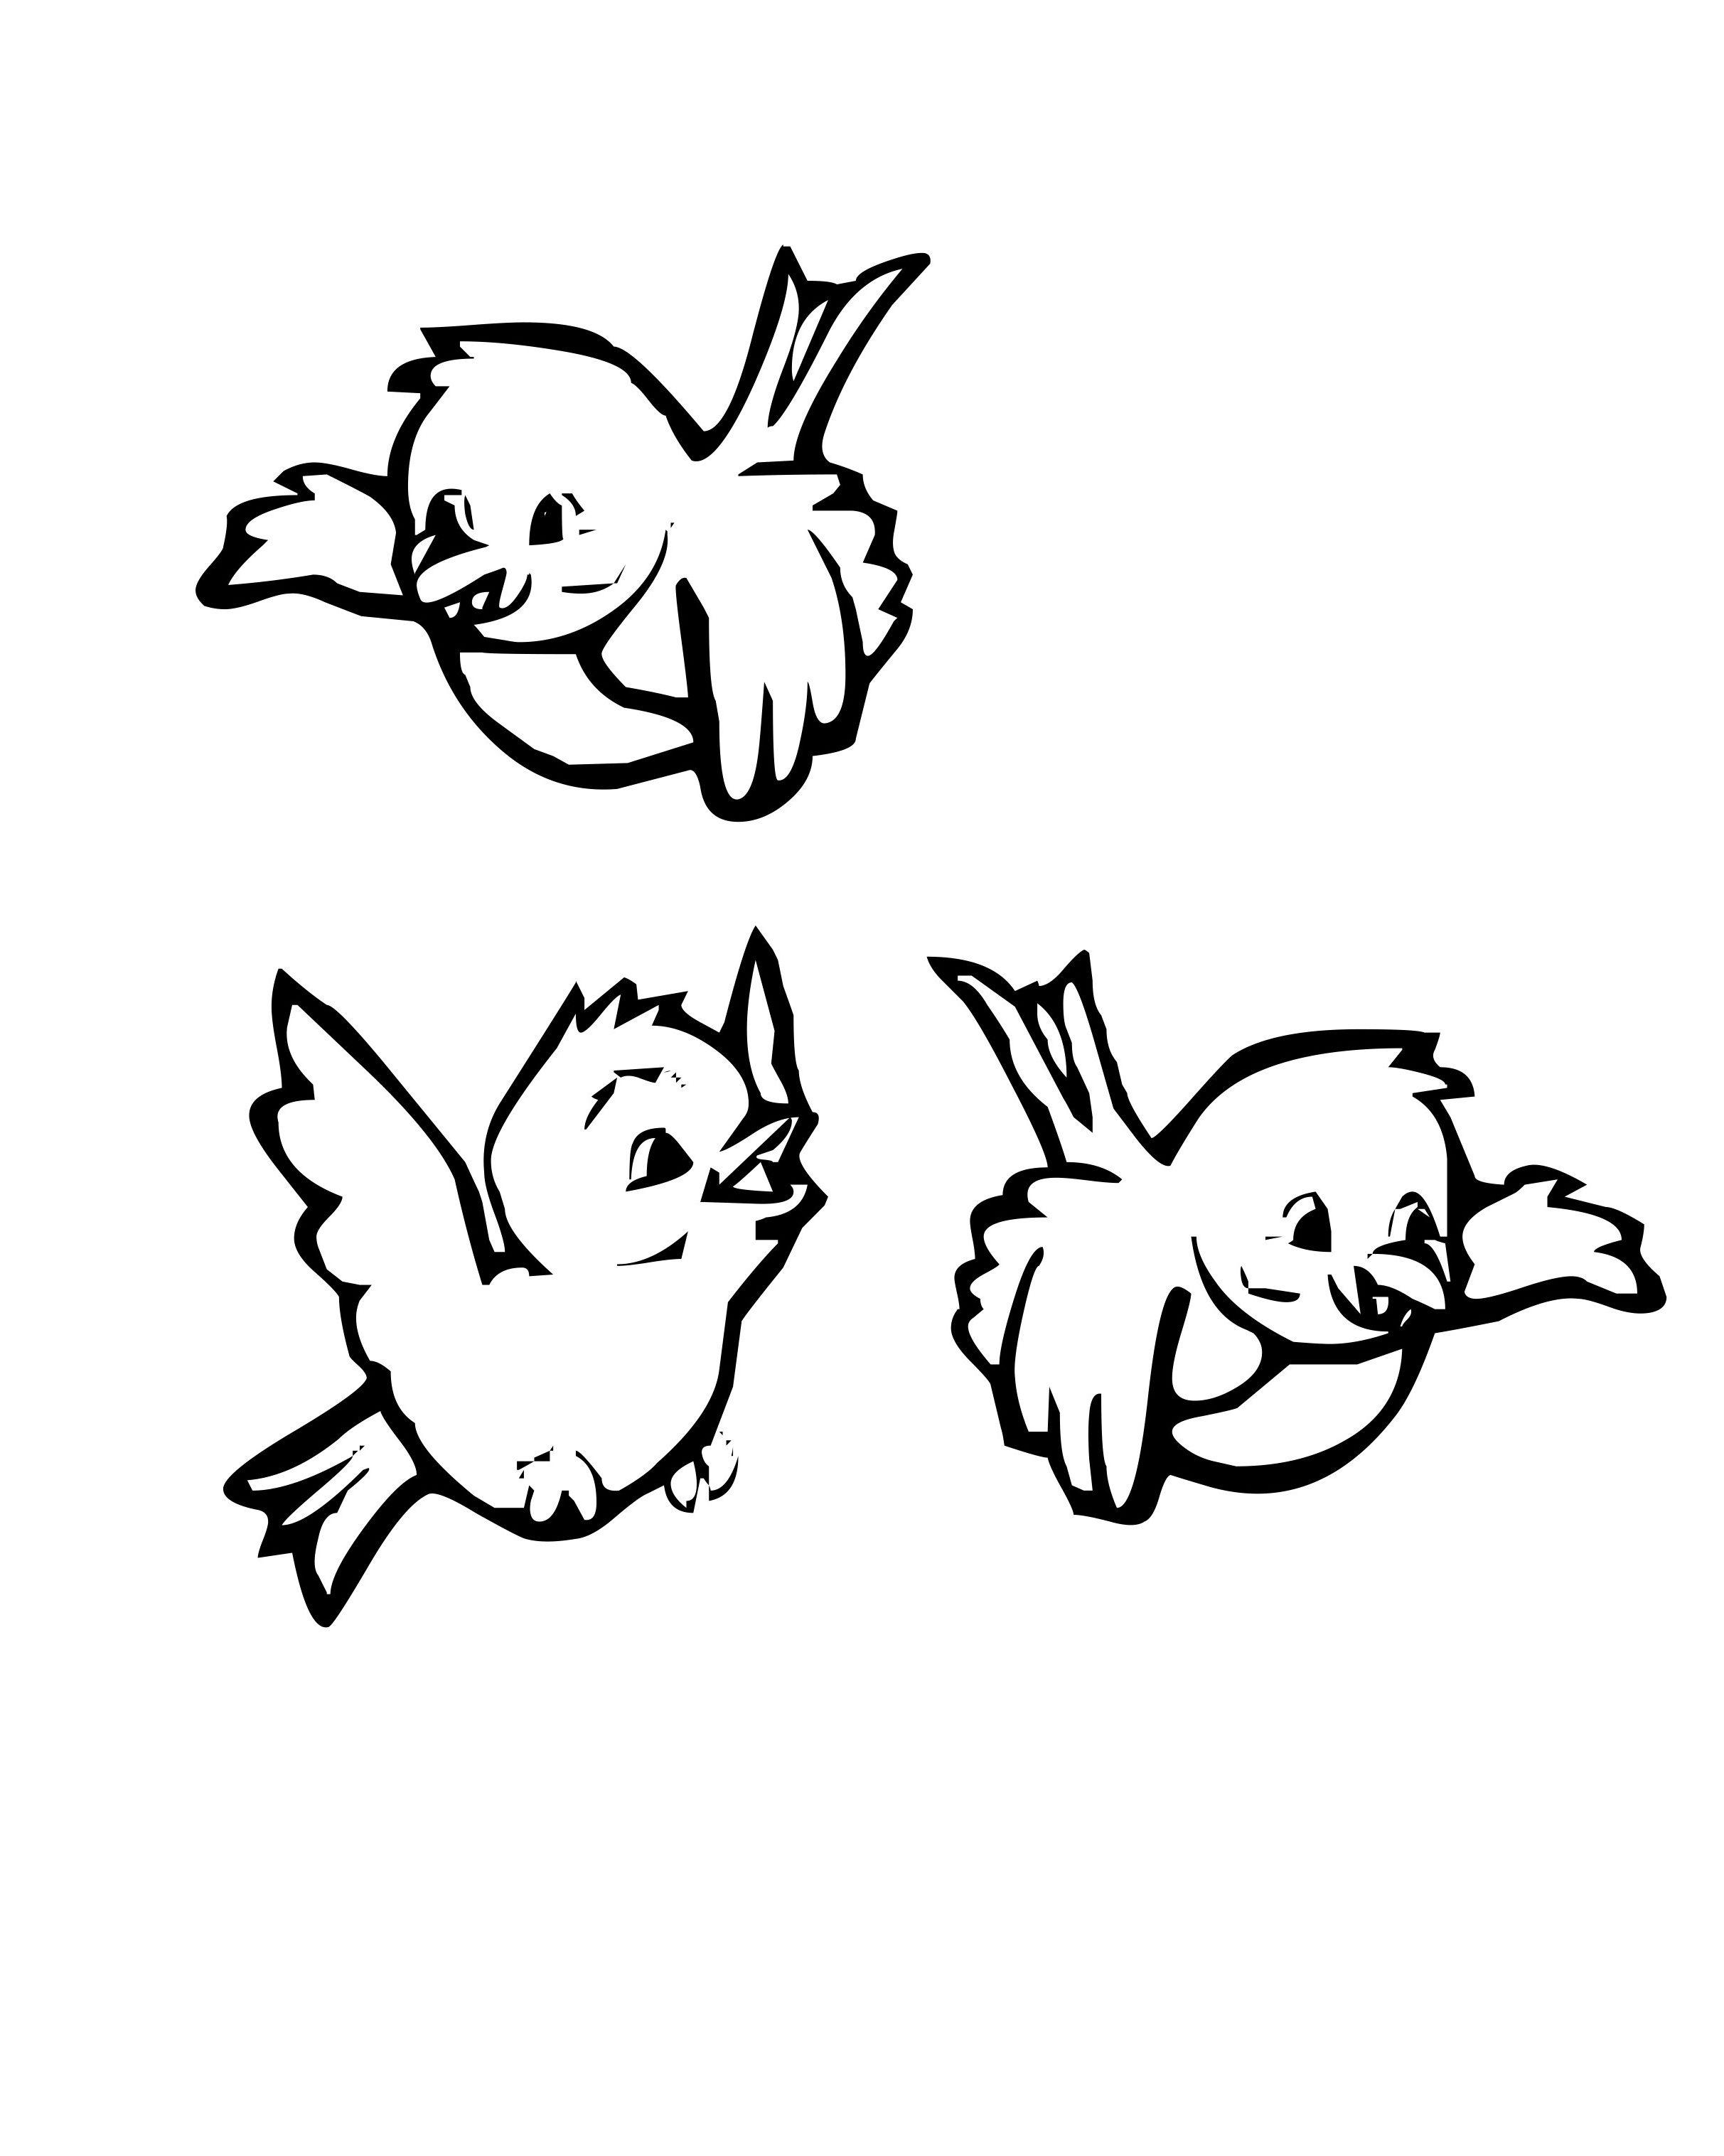 Beau Coloriage A Imprimer Angry Bird Rio